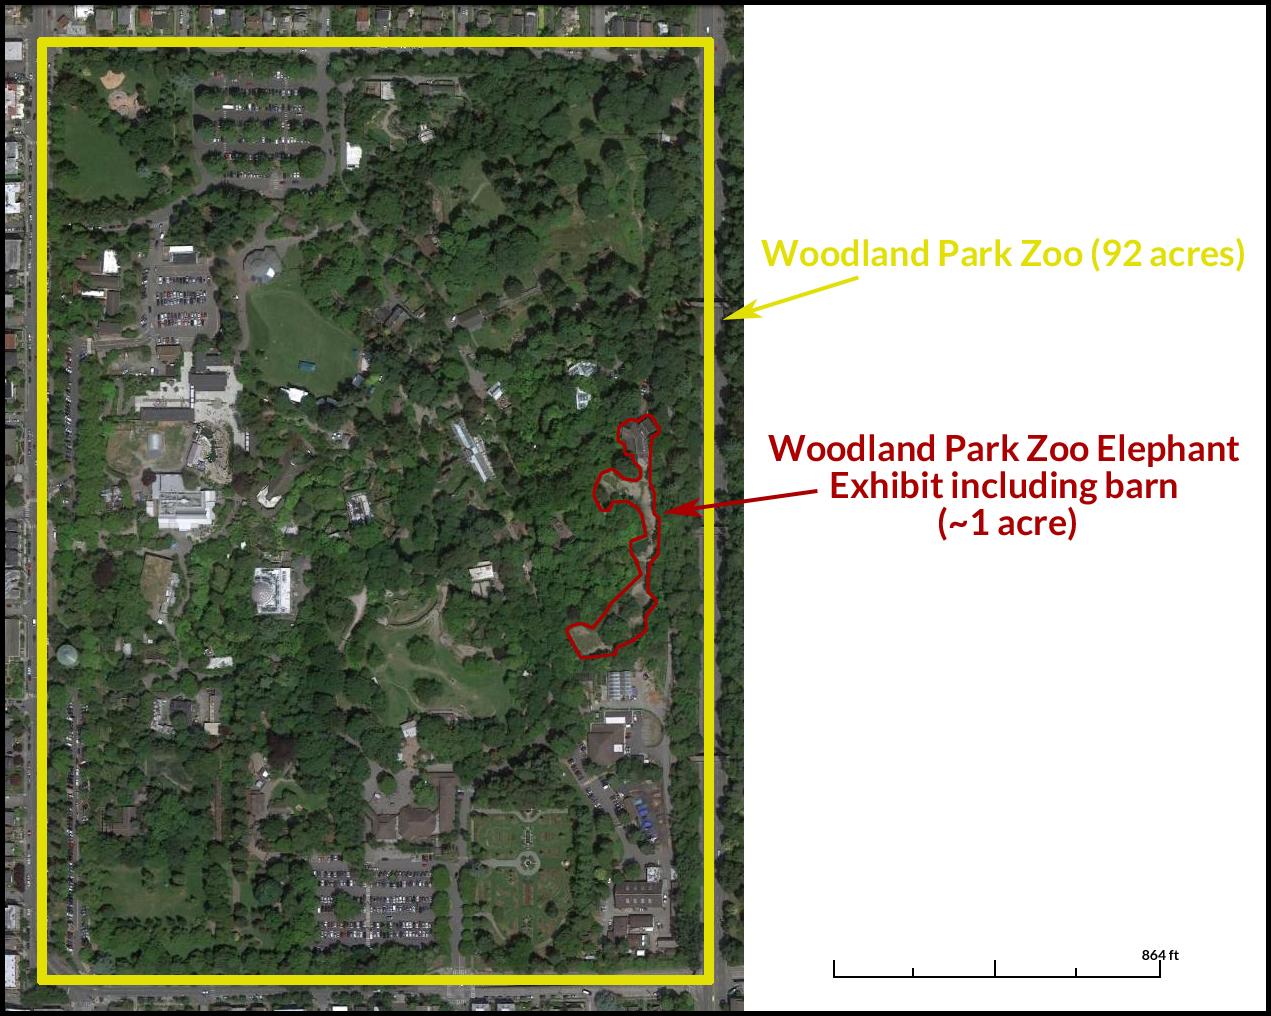 Woodland Park Zoo (92 acres)